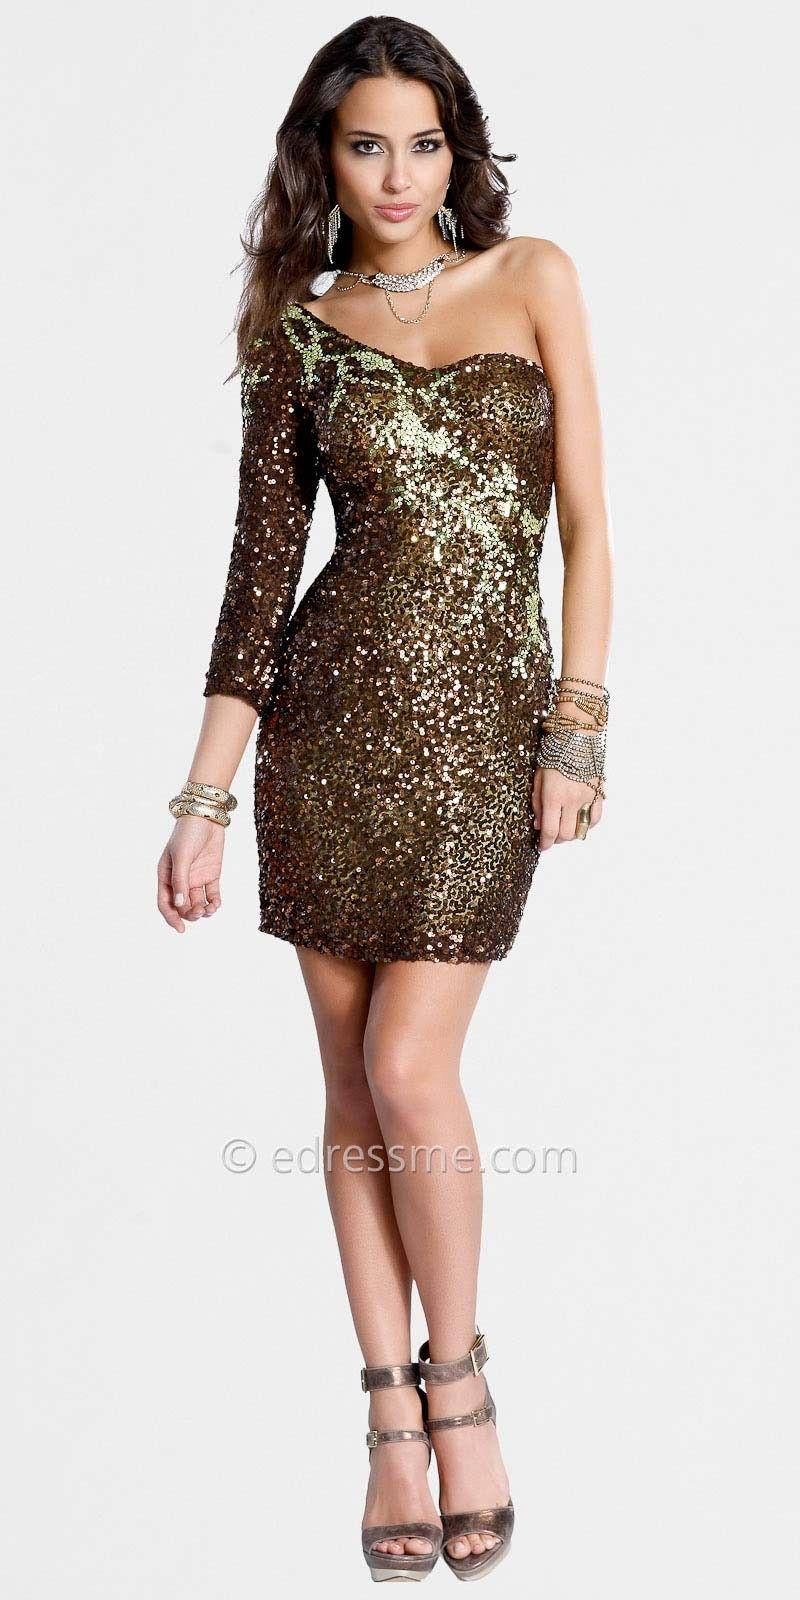 Elegant. #MillionDollarShoppersGianna | Fashion | Pinterest ...